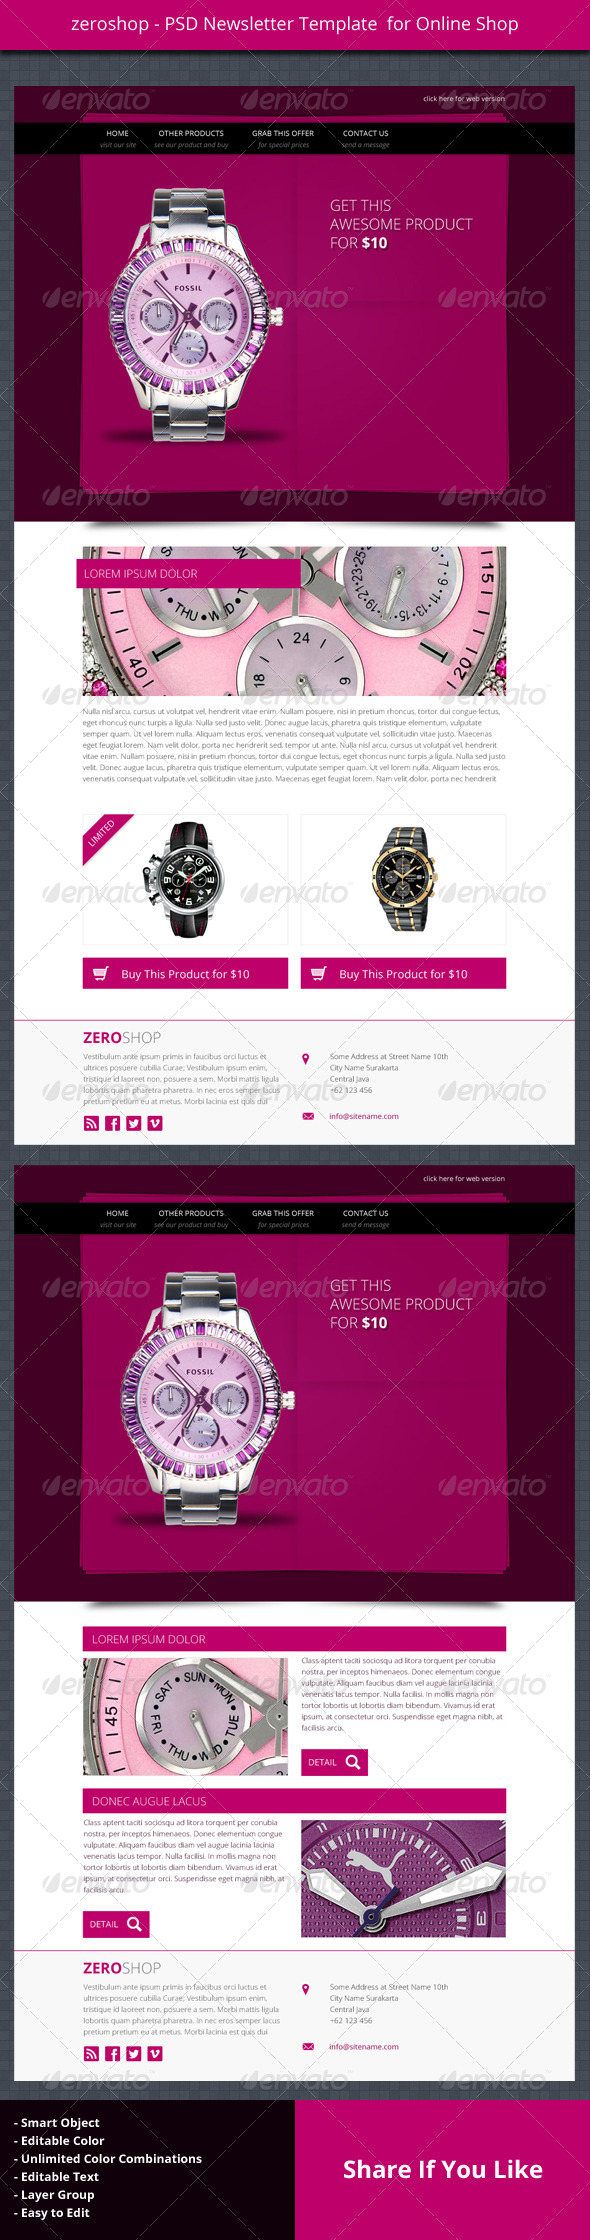 GraphicRiver zeroshop PSD Newsletter Template For Online Shop 4601604